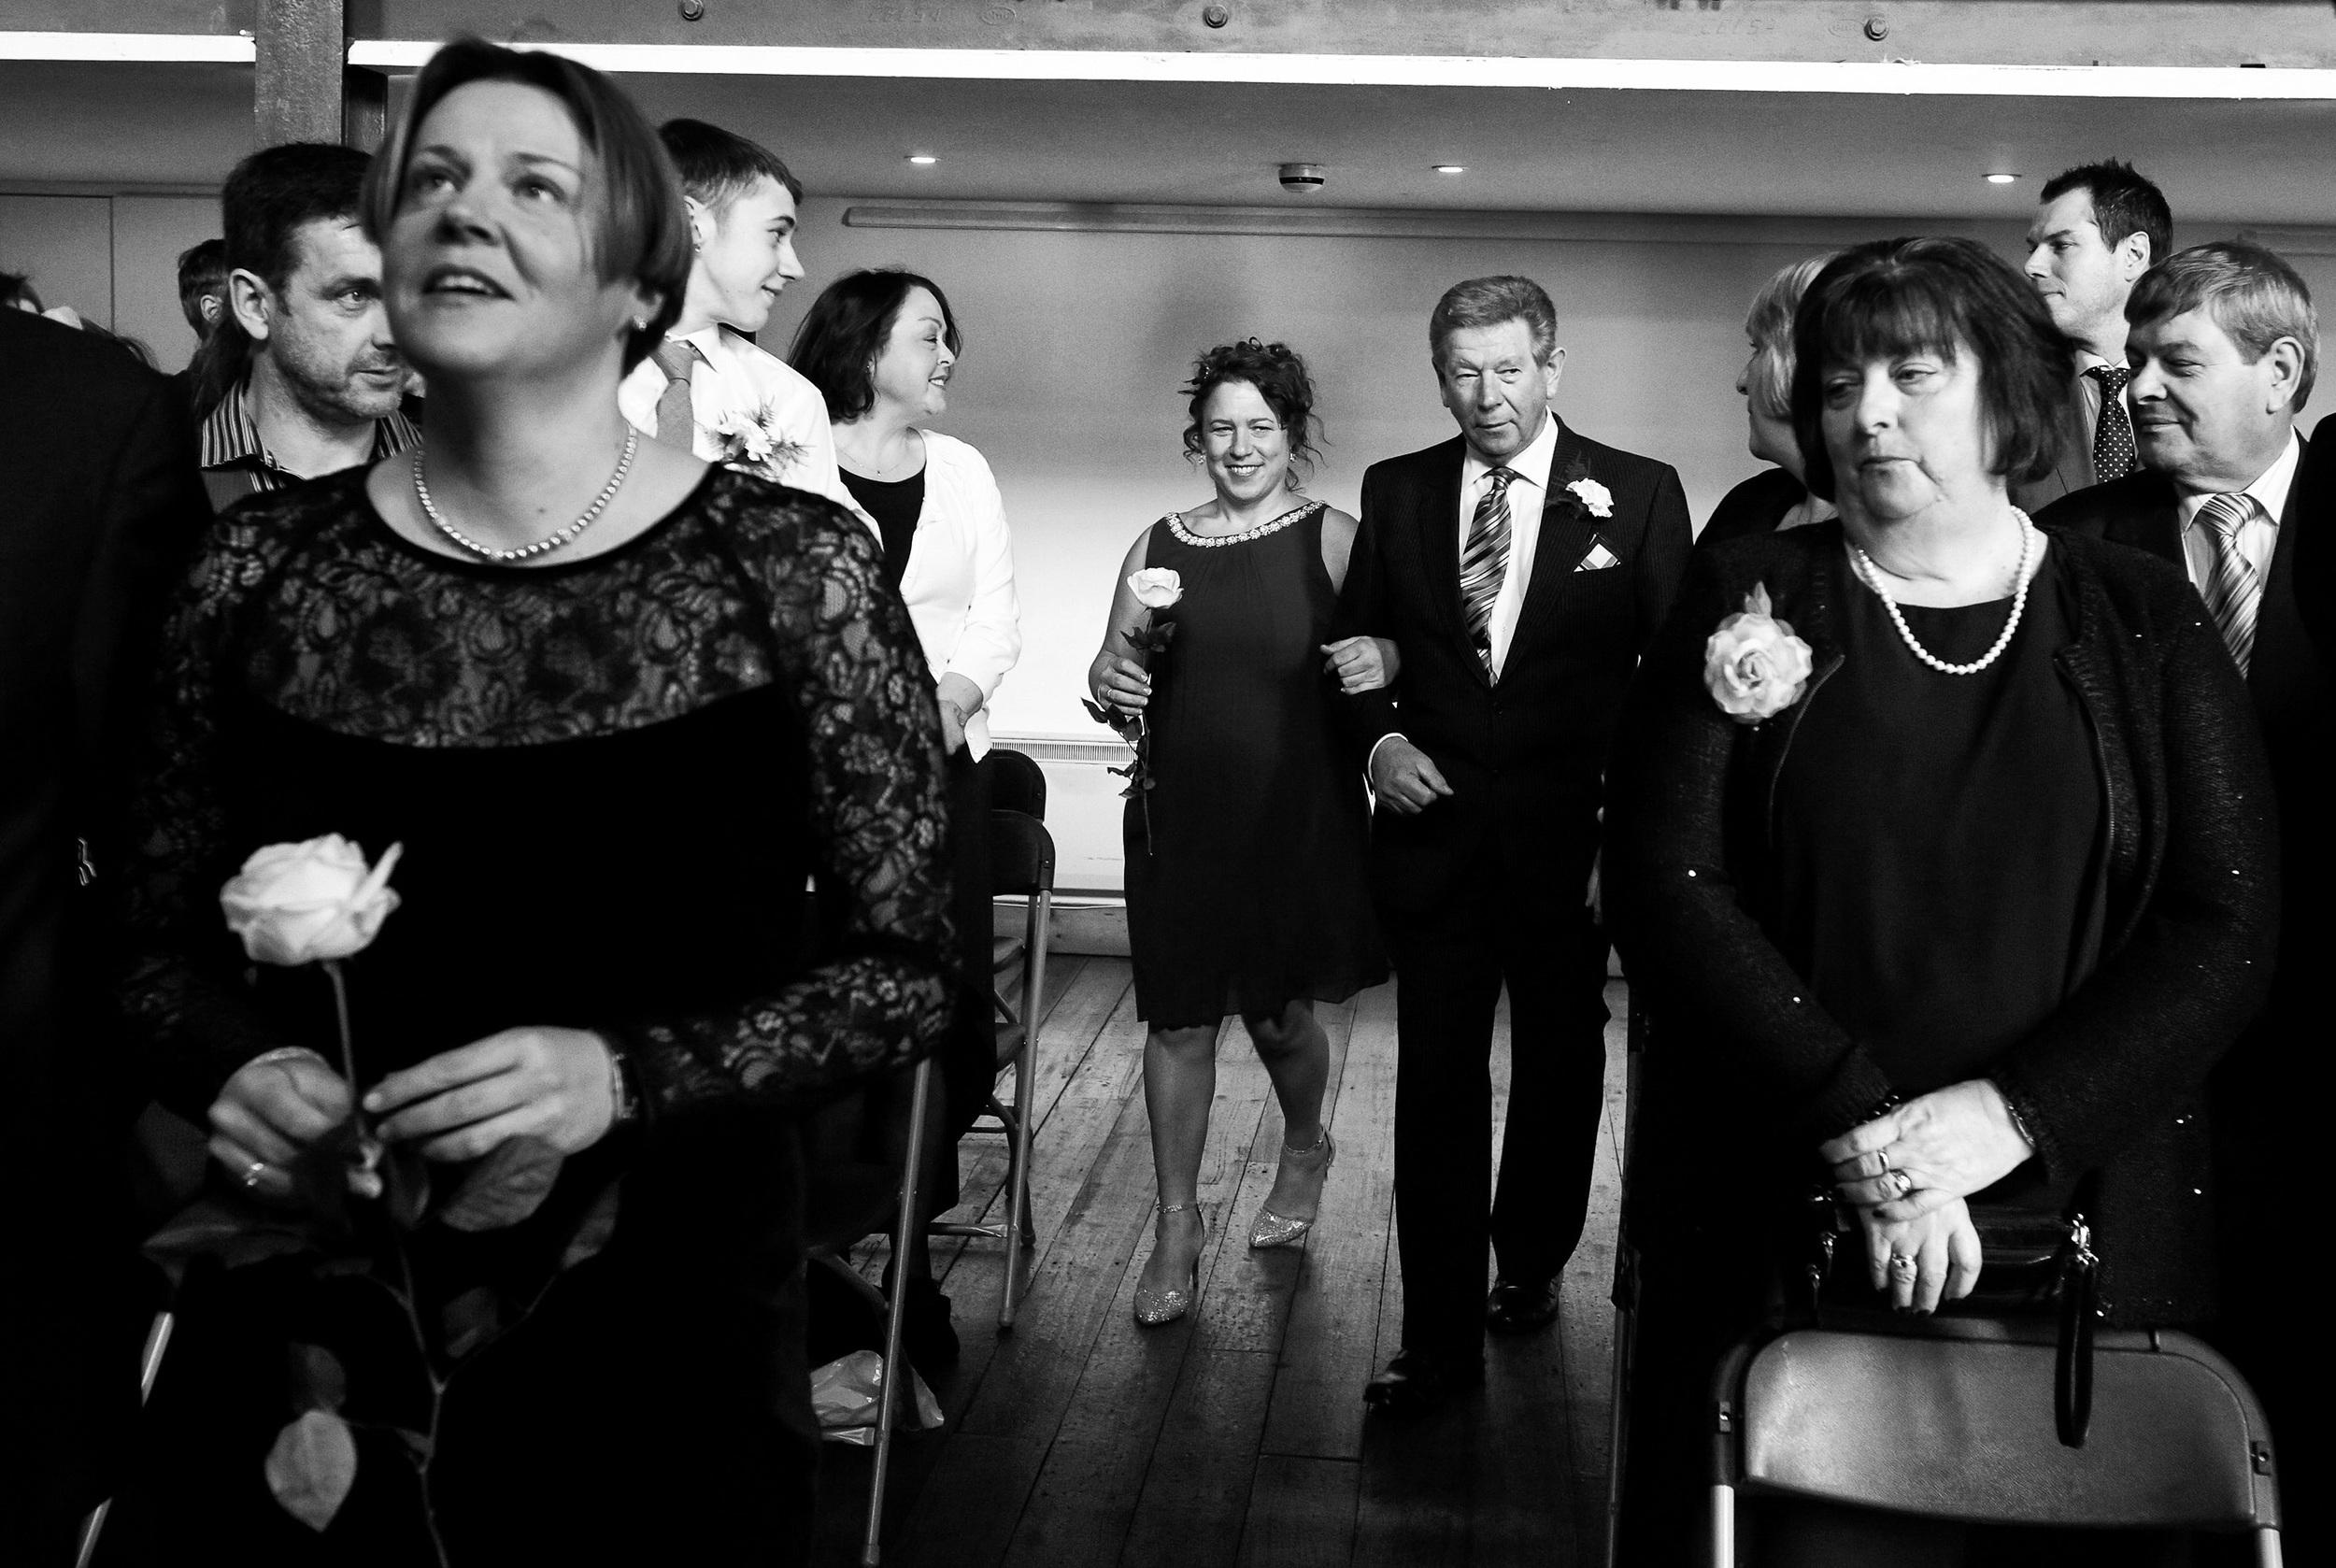 wedding-photography-paintworks-bristol-013.JPG